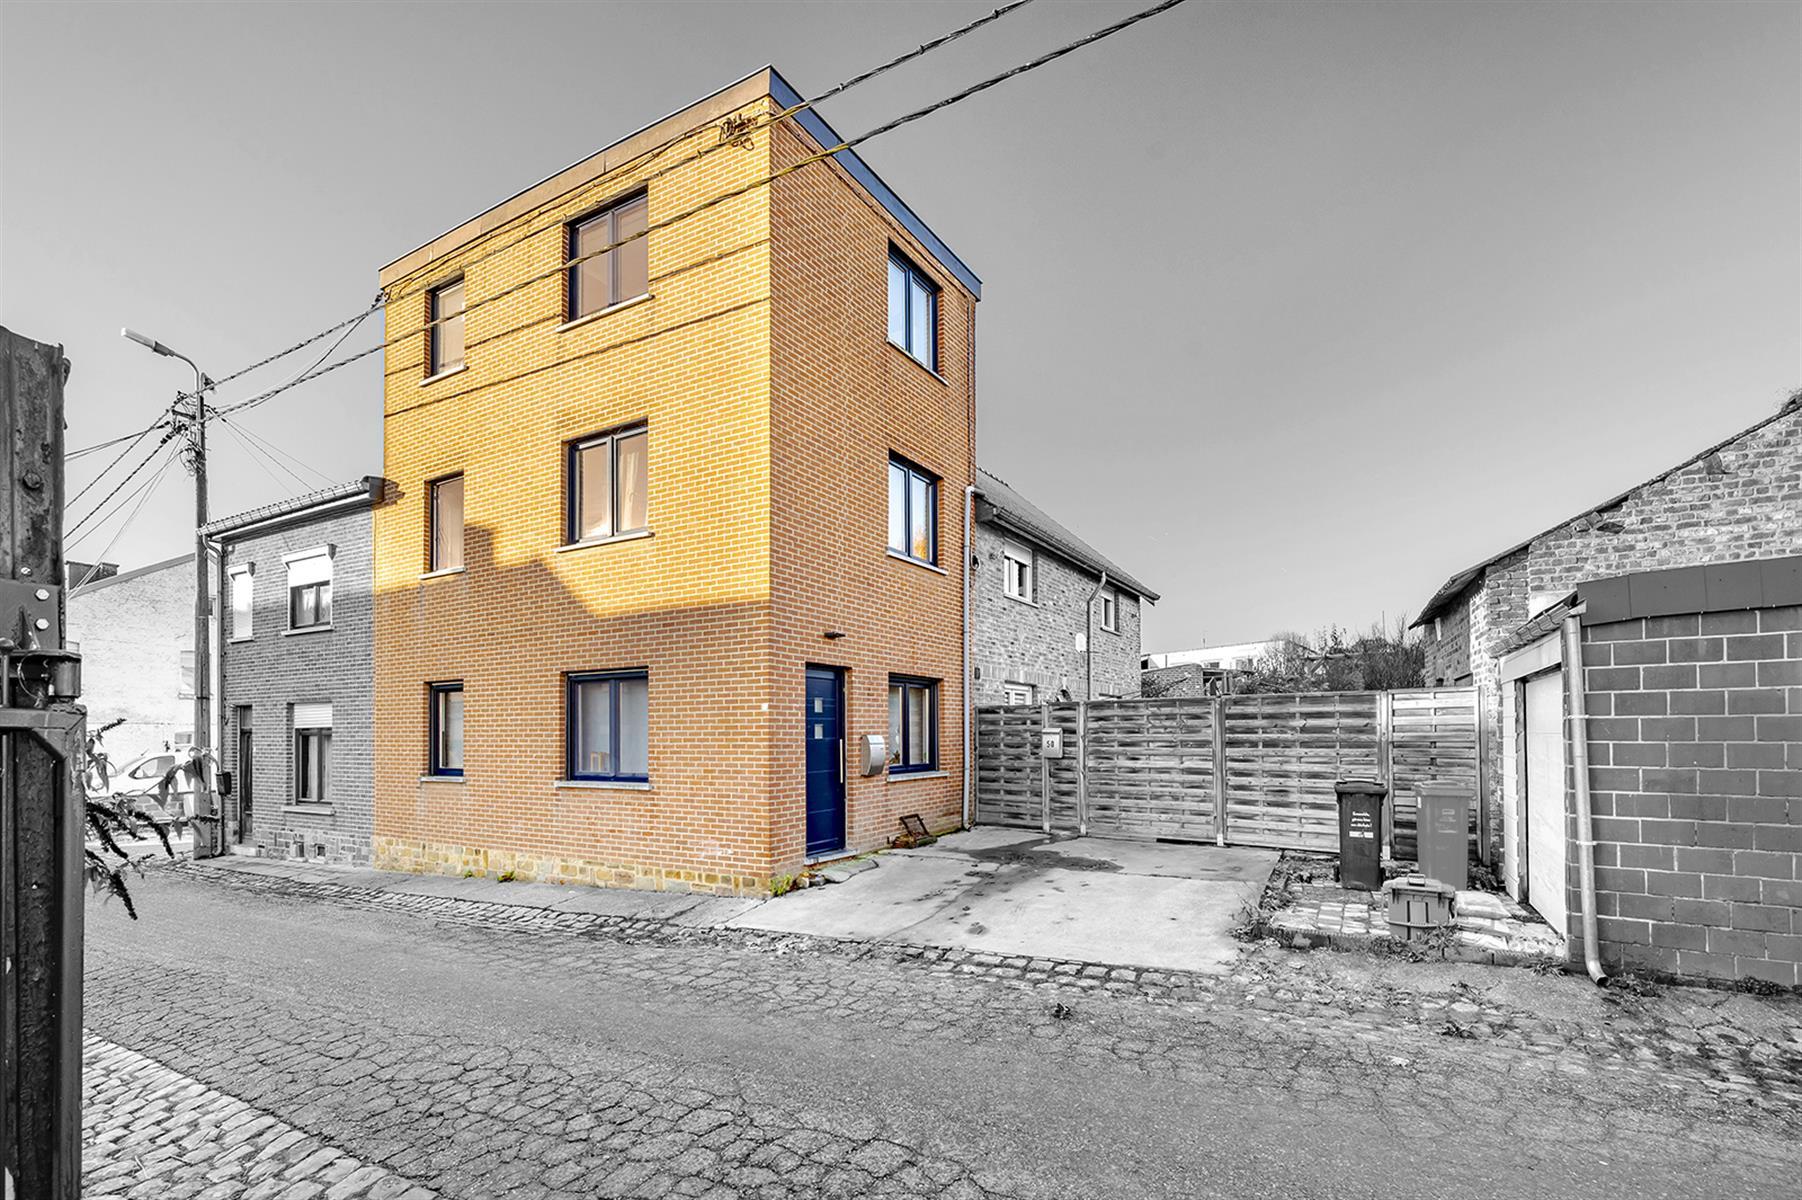 Maison - Remicourt - #3923927-19